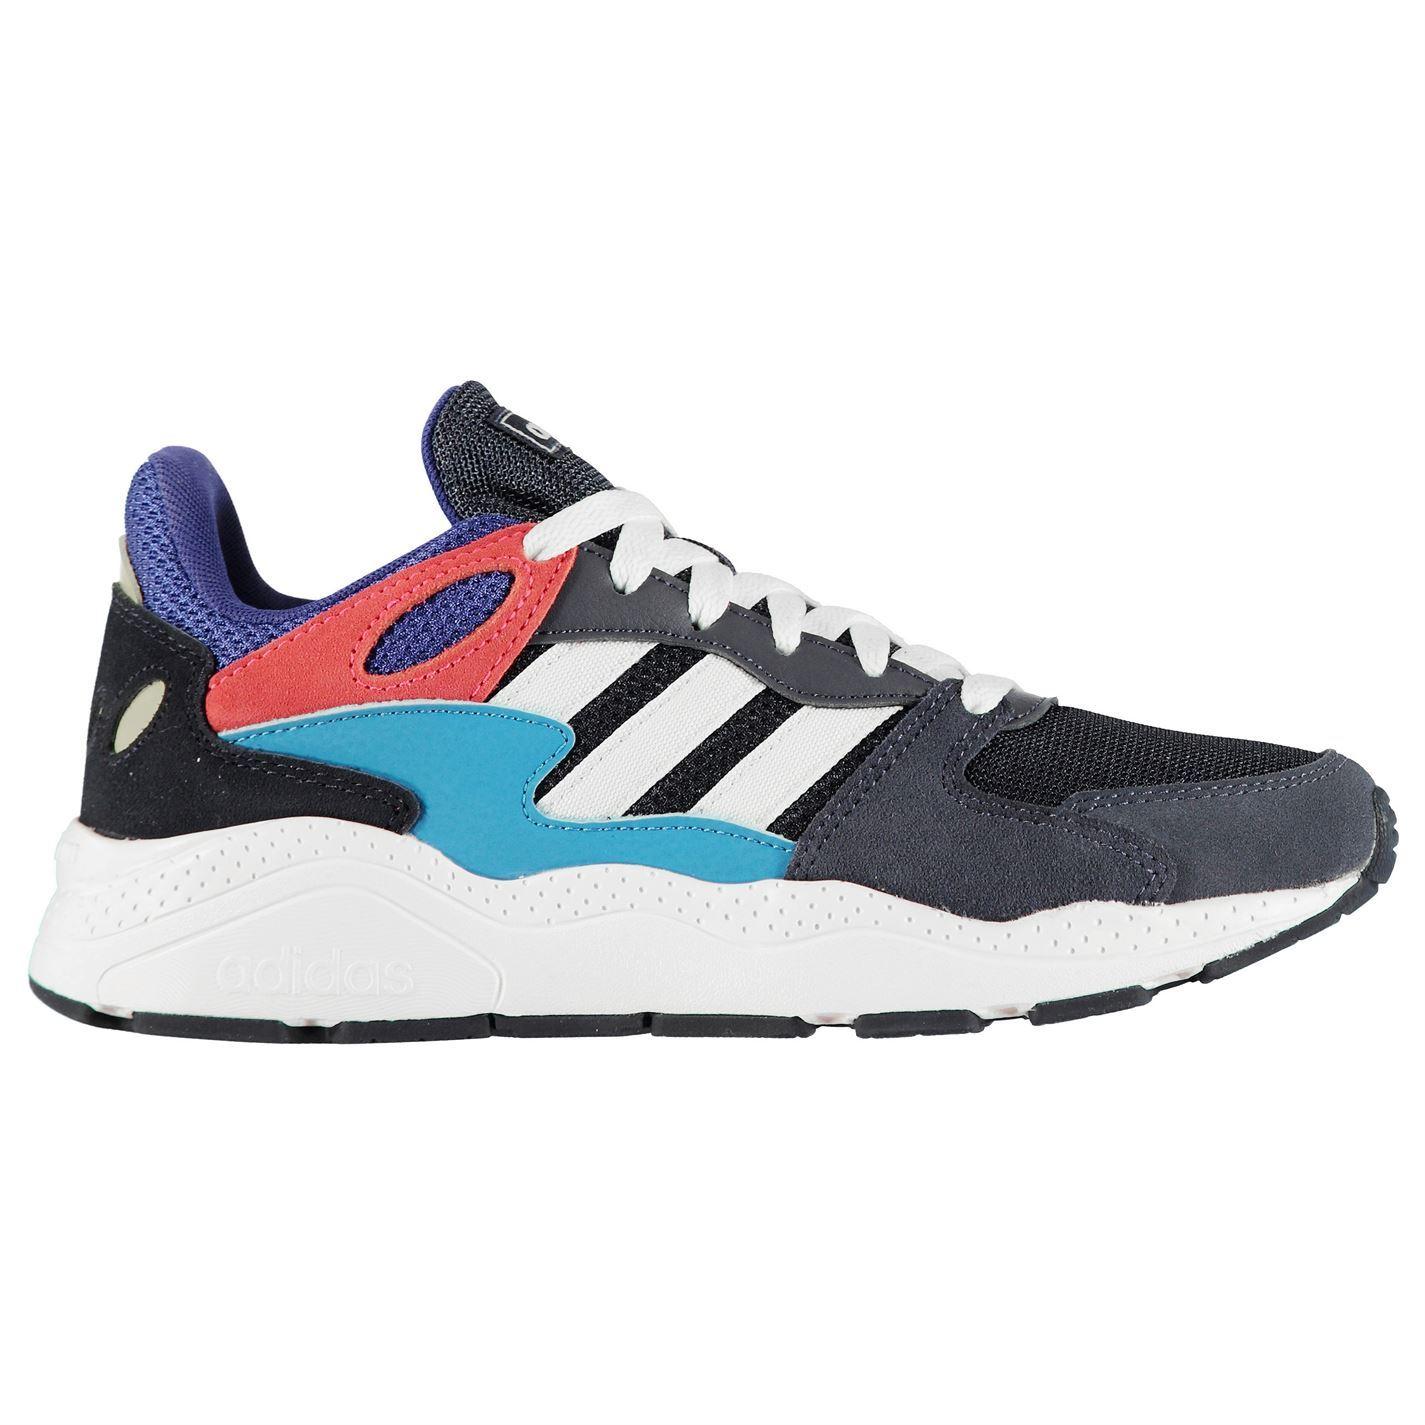 Adidas-Crazychaos-Baskets-Homme-Chaussures-De-Loisirs-Chaussures-Baskets miniature 22